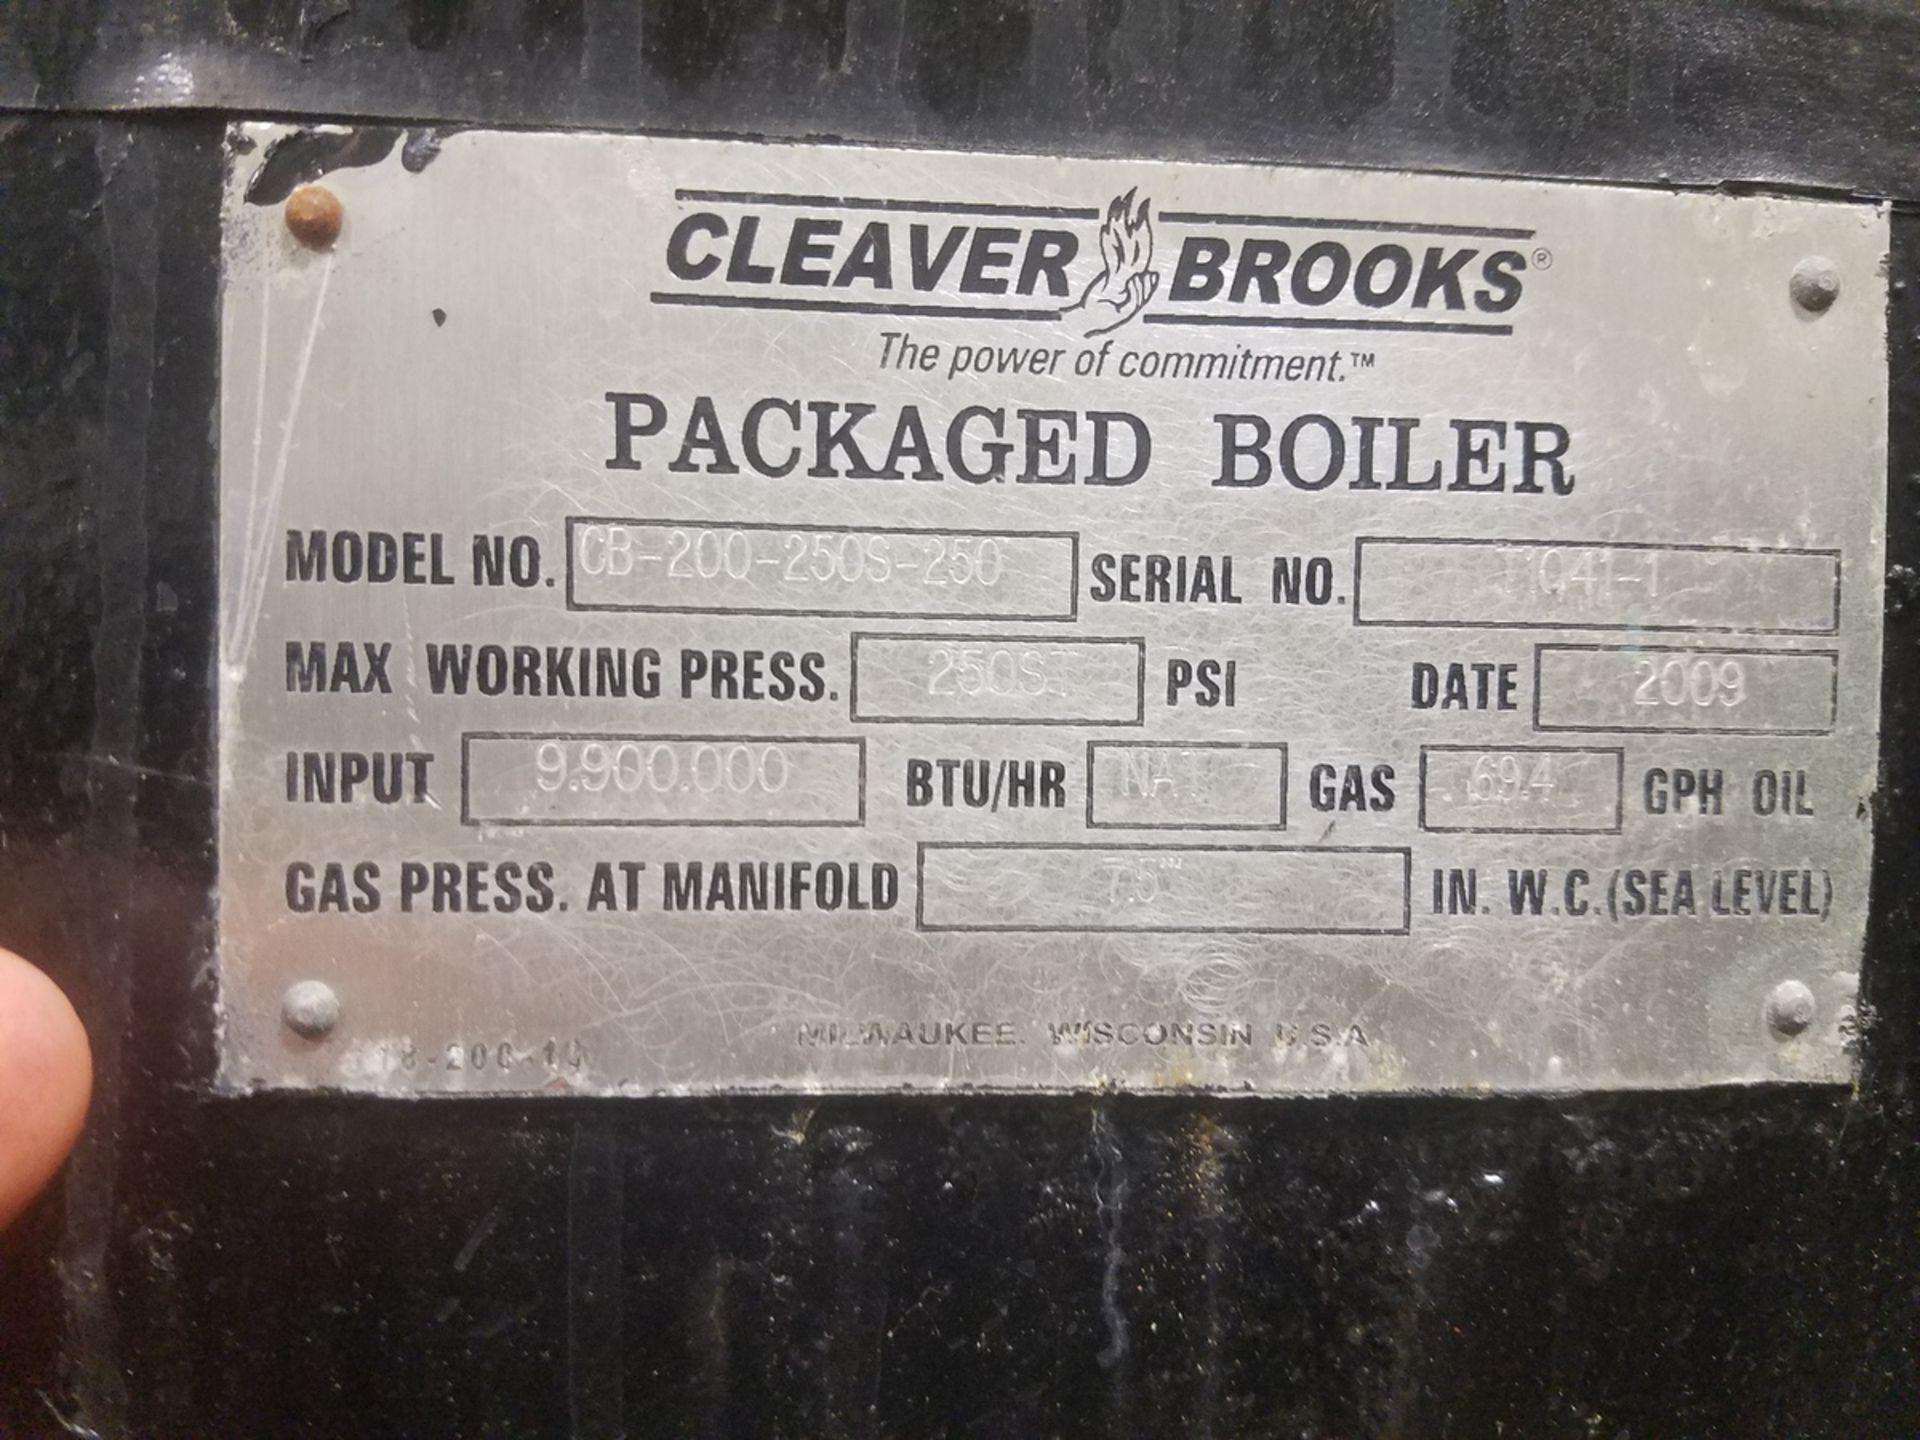 2009 (Rebuilt 2016) 250 HP Cleaver Brooks Boiler, 8.9 mmBTU, M# CB-200-250S-250, | Rig Fee: $5000 - Image 2 of 7